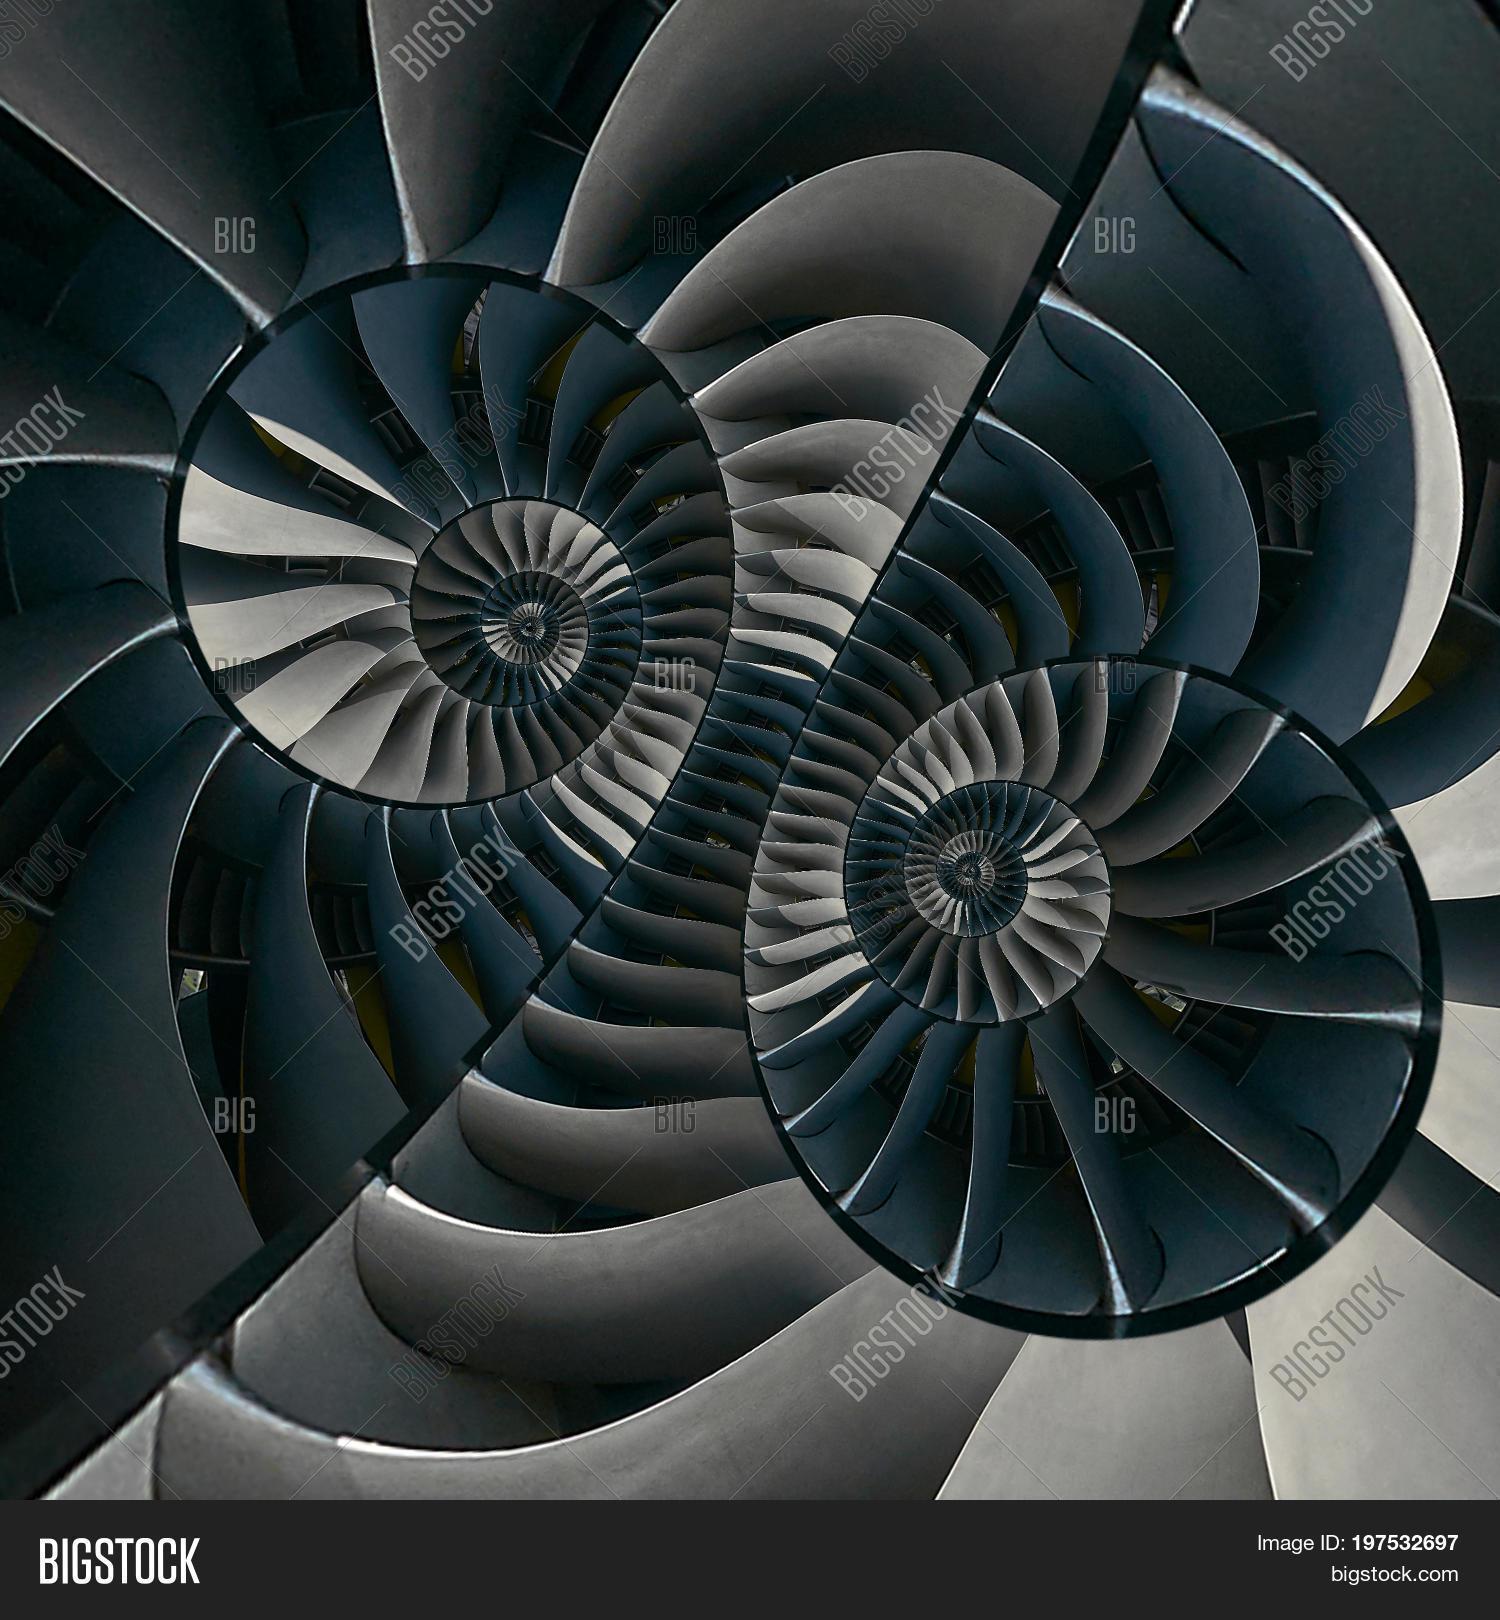 Turbine Blades Wings Surreal Spiral Image & Photo | Bigstock